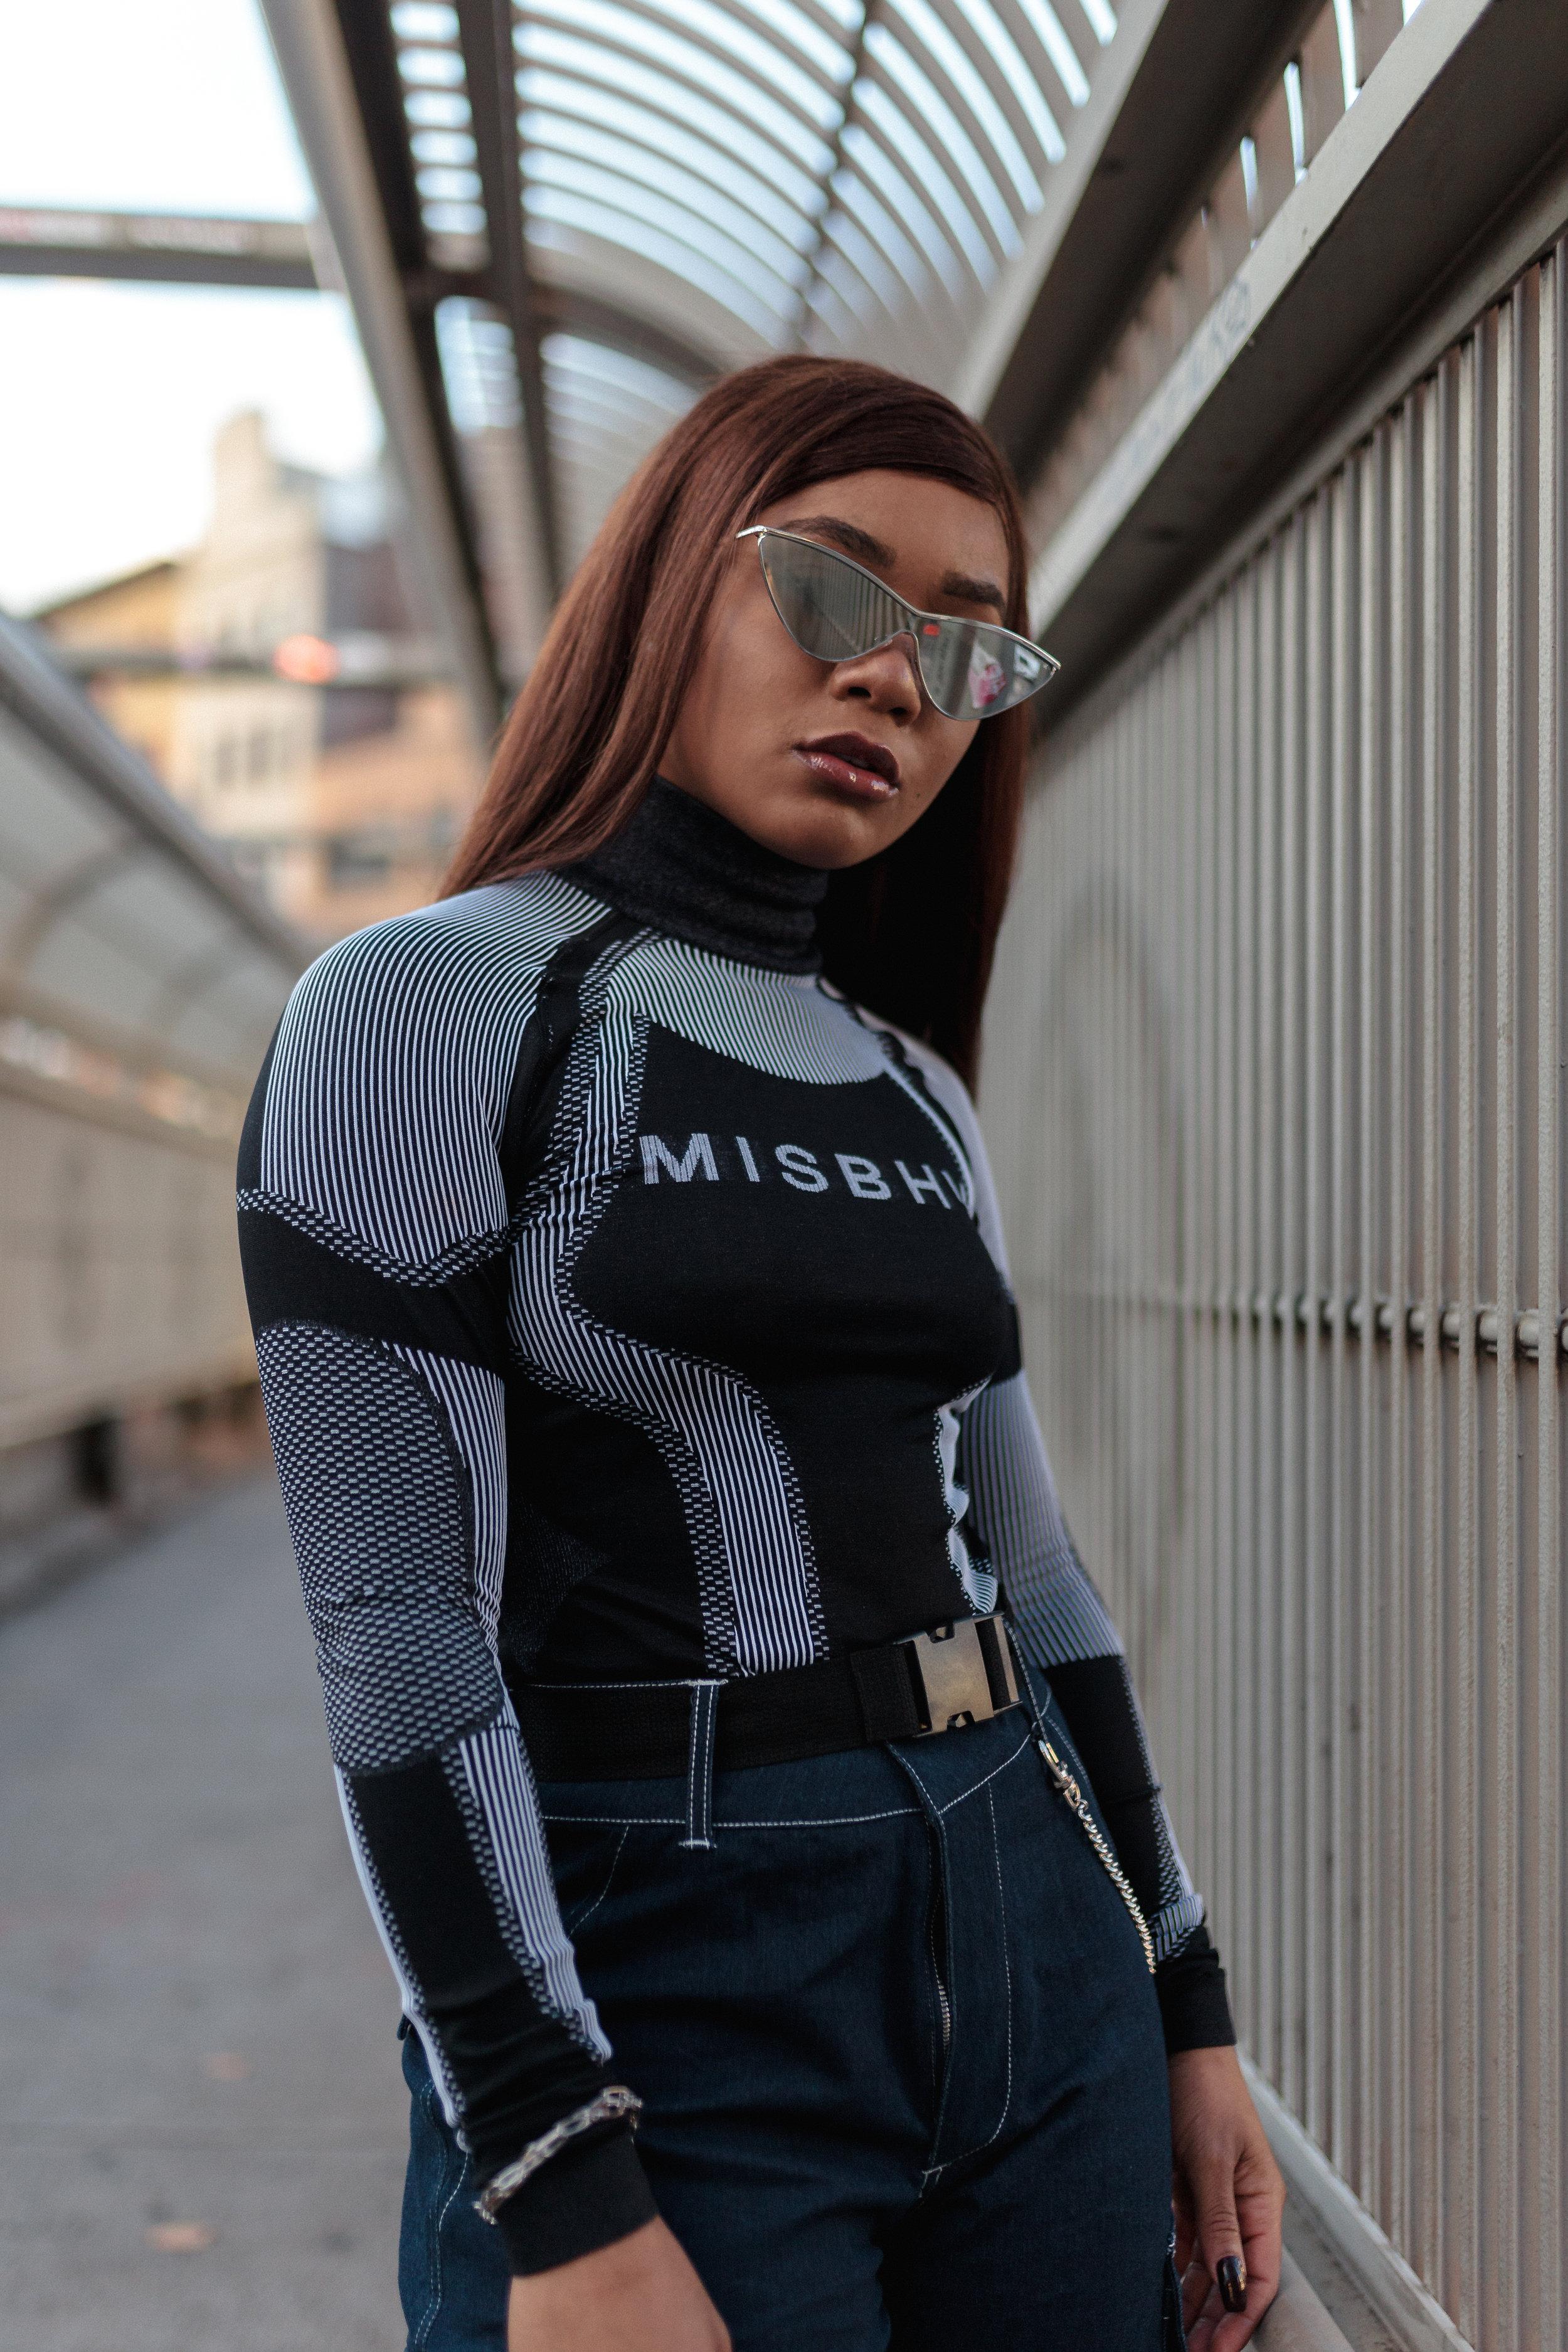 Marisa-013.jpg